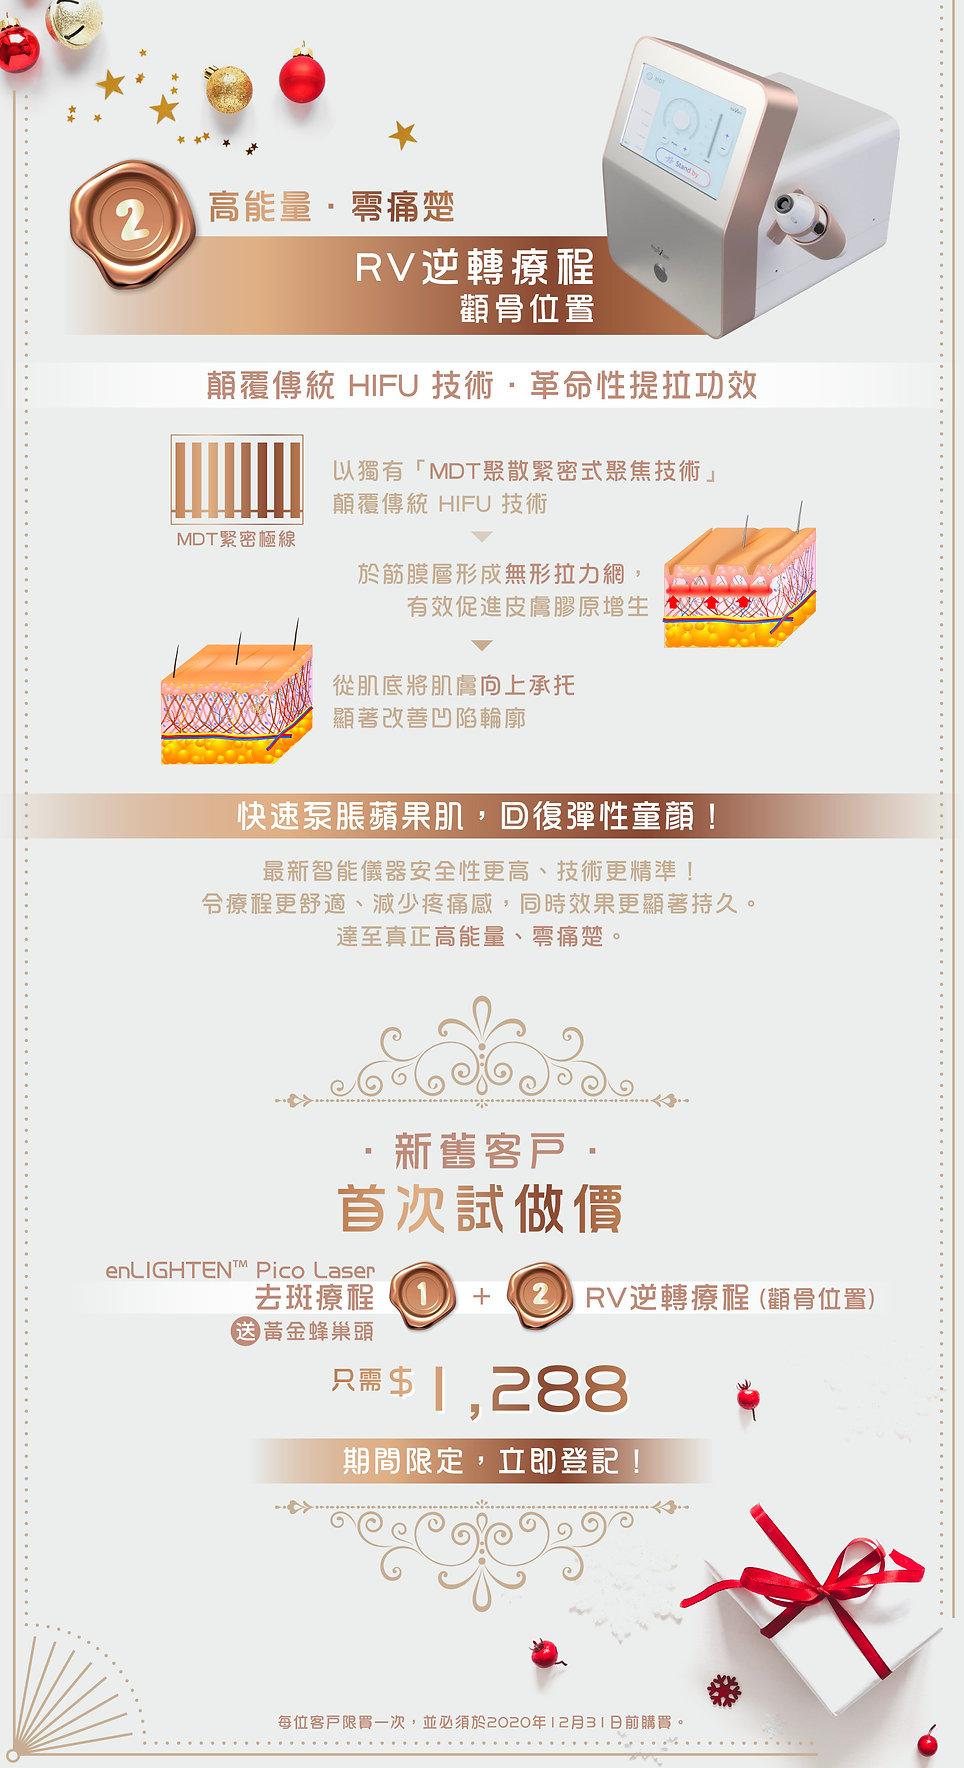 20201112 (GDN Landing Page) 聖誕Pico + RV_